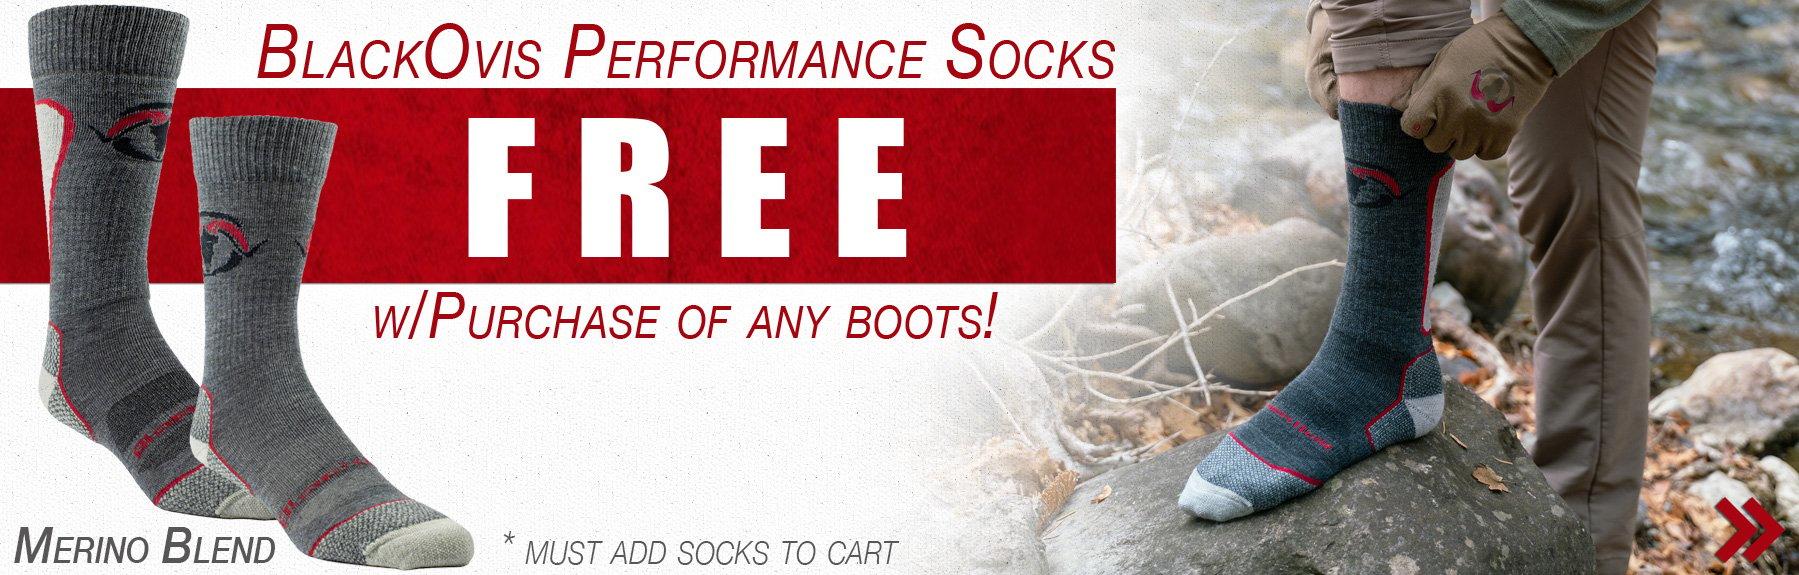 Free BlackOvis Merino Socks with Boots